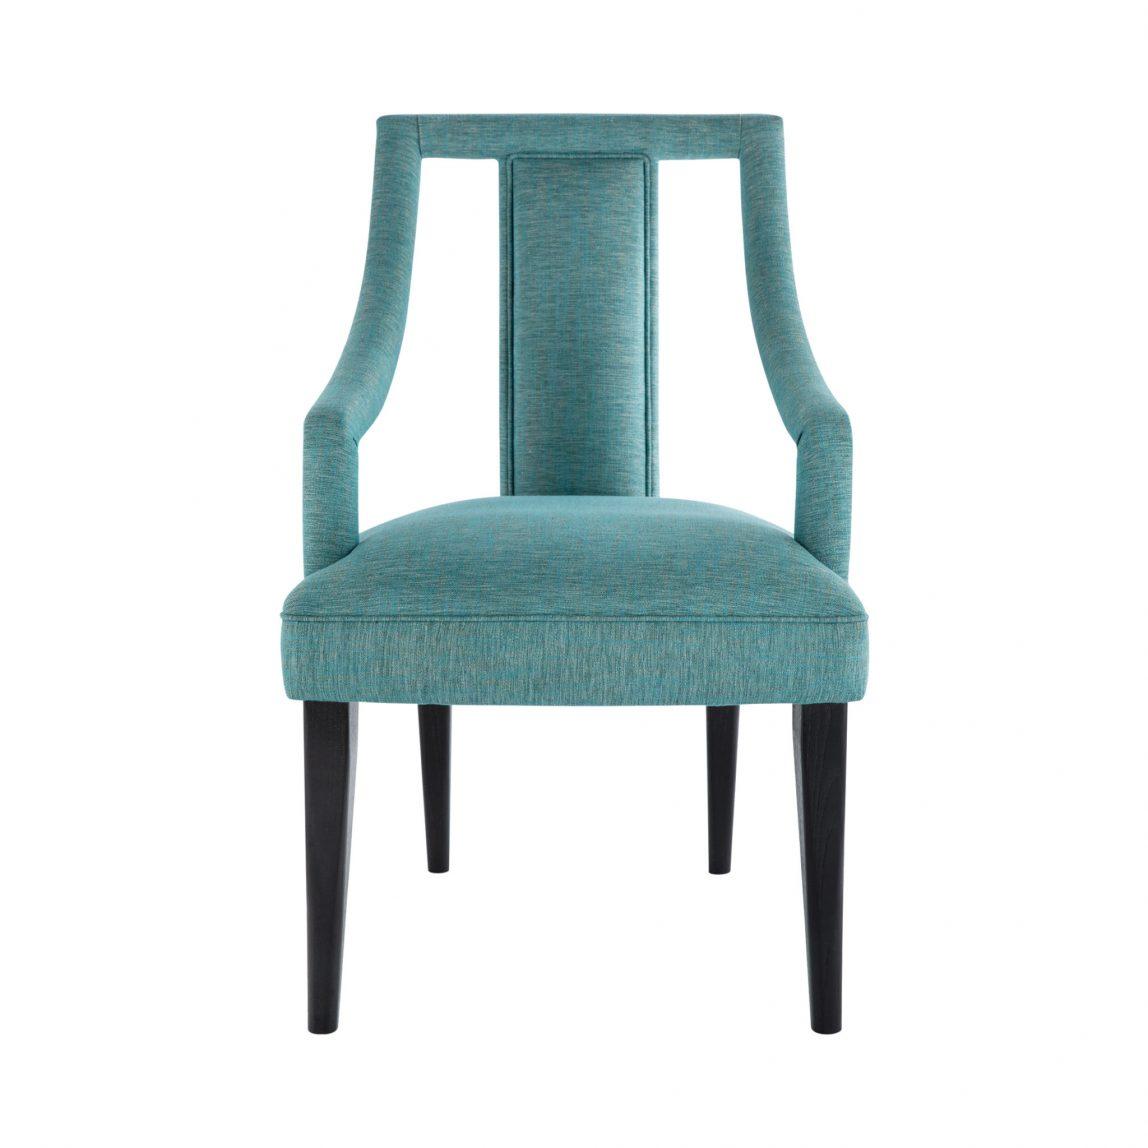 Обеденный стул Натан бирюзового цвета, реплика брабу, реплика мунна